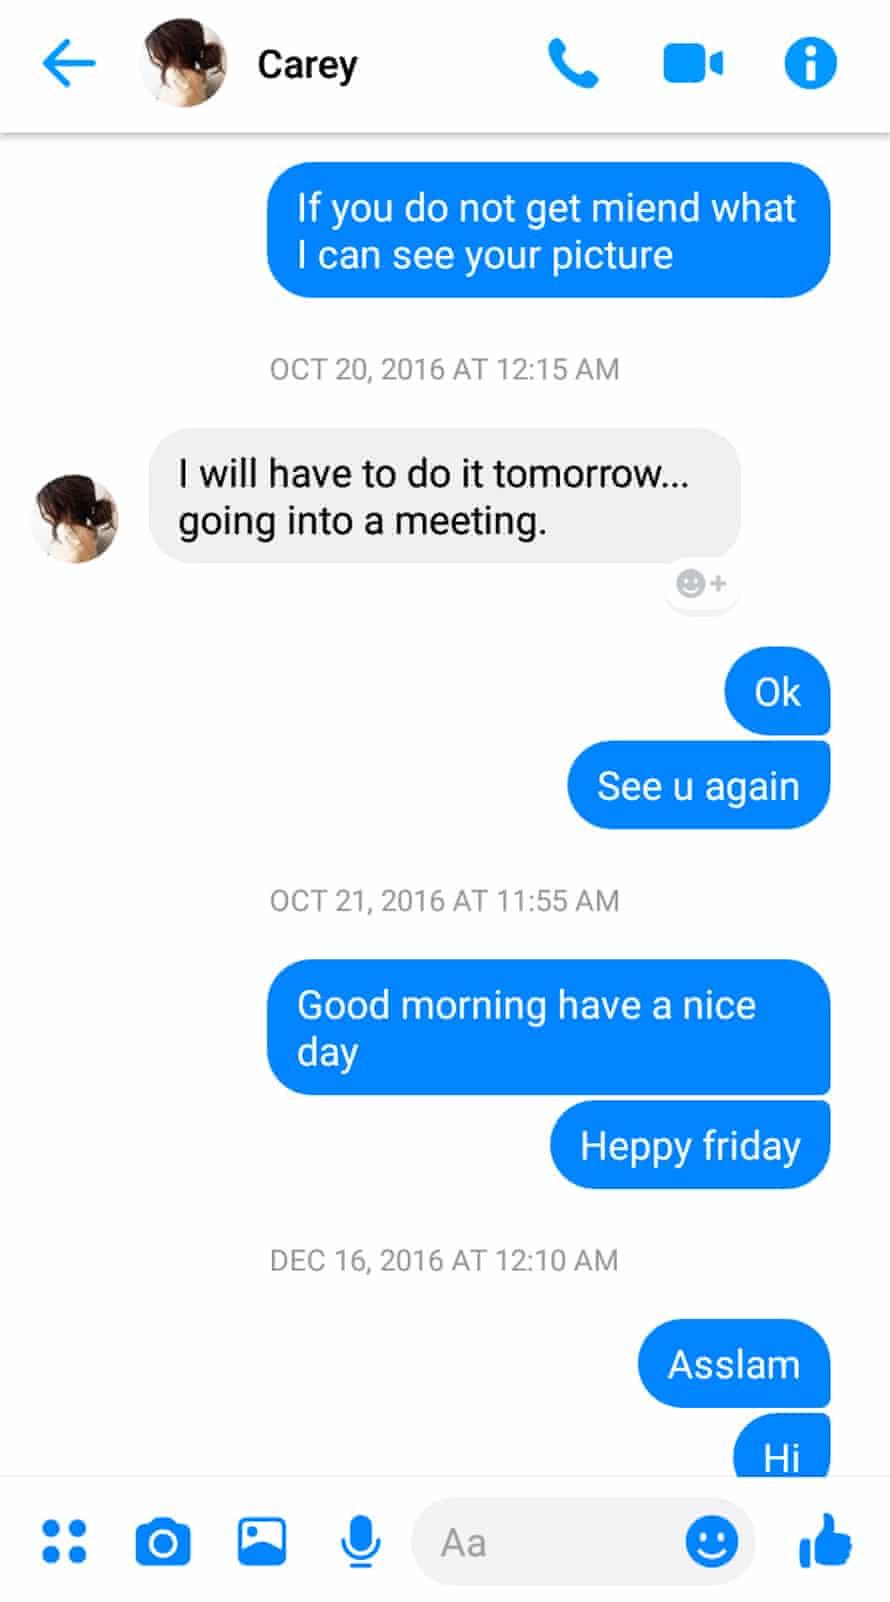 Carey Ferrante's Facebook Messenger chat